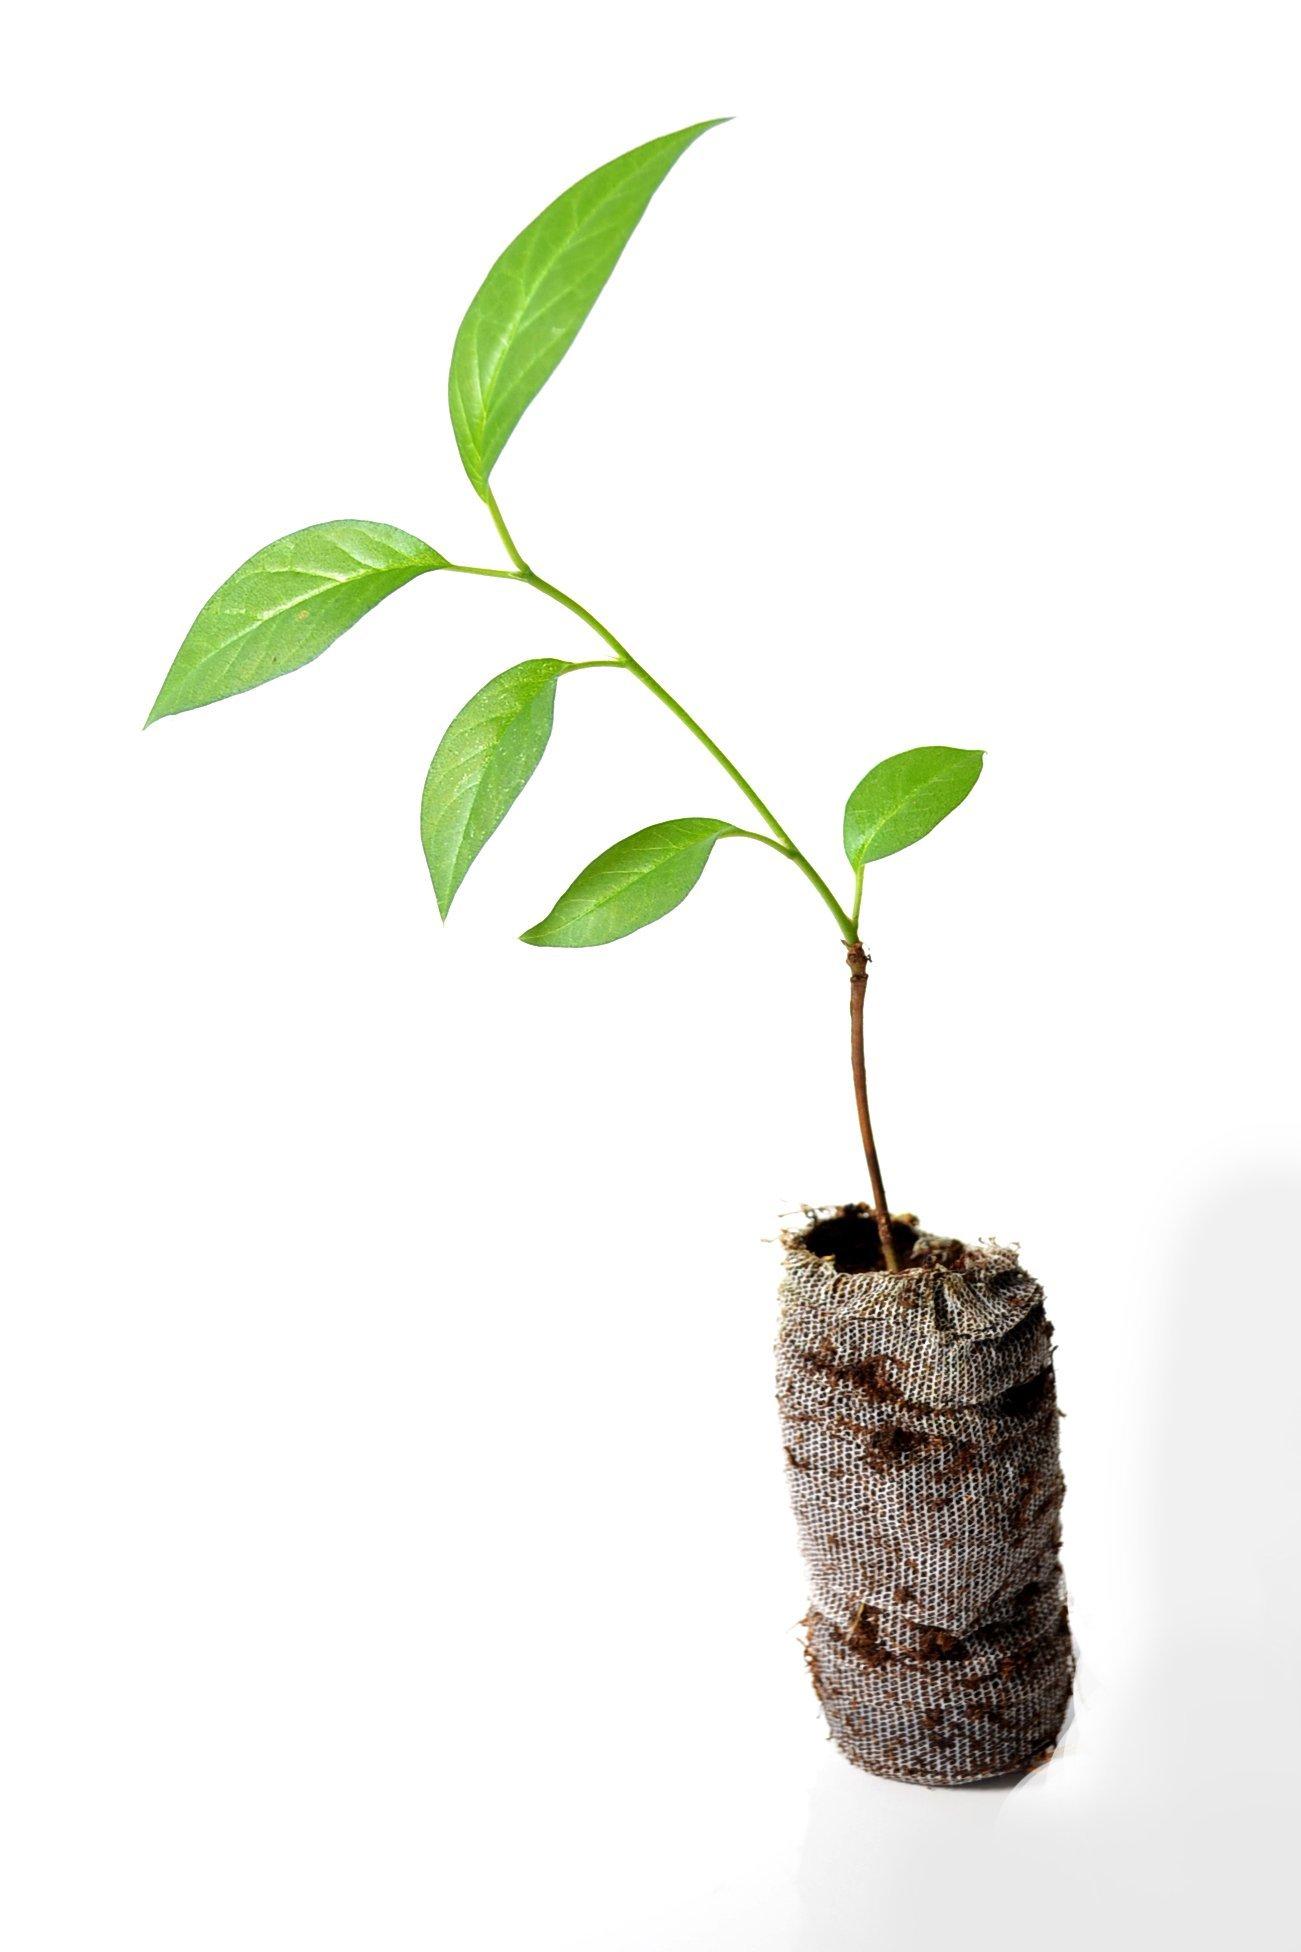 TreesAgain Lot of 3 Osage Orange Tree - Maclura pomifera - starter plugs (See State Restrictions)